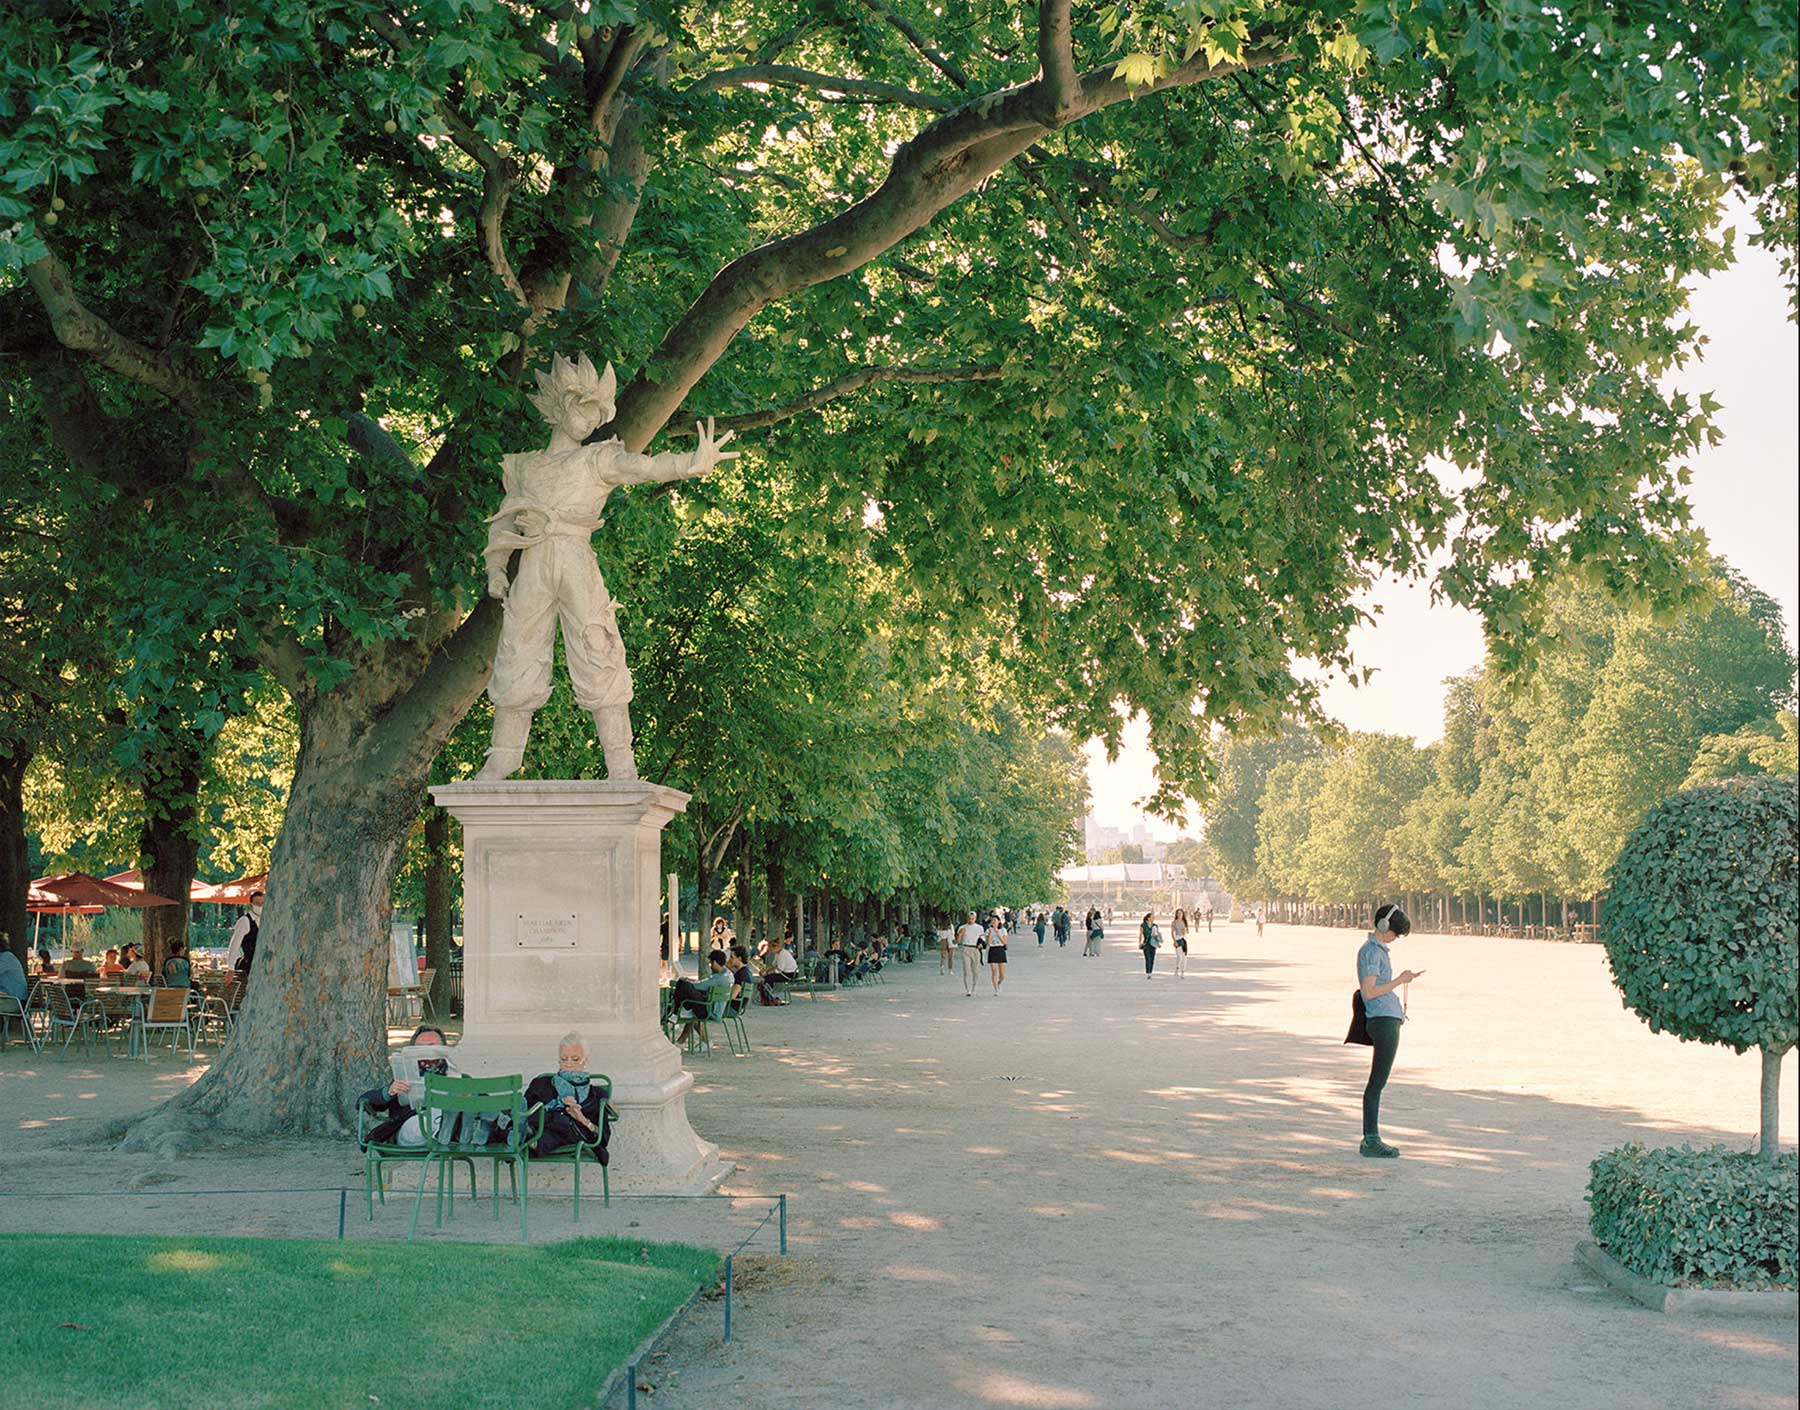 Popkulturen-Statuen Monuments_Benoit-Lapray_06